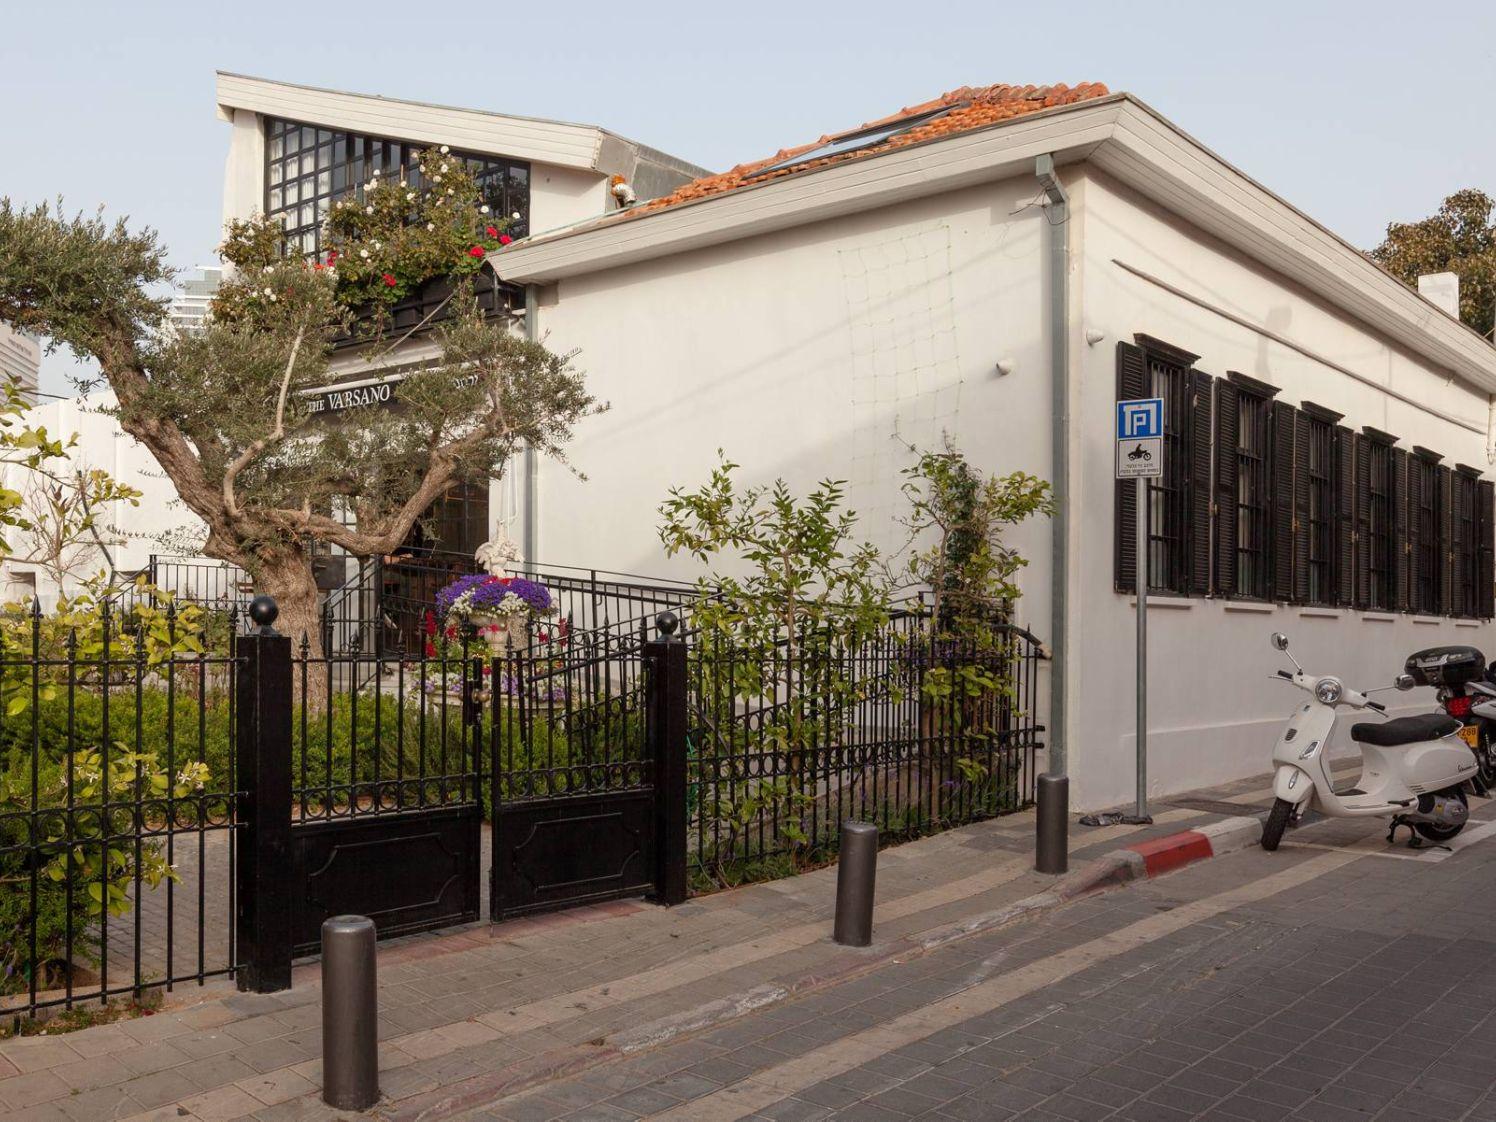 images Gal gadot in tel aviv israel